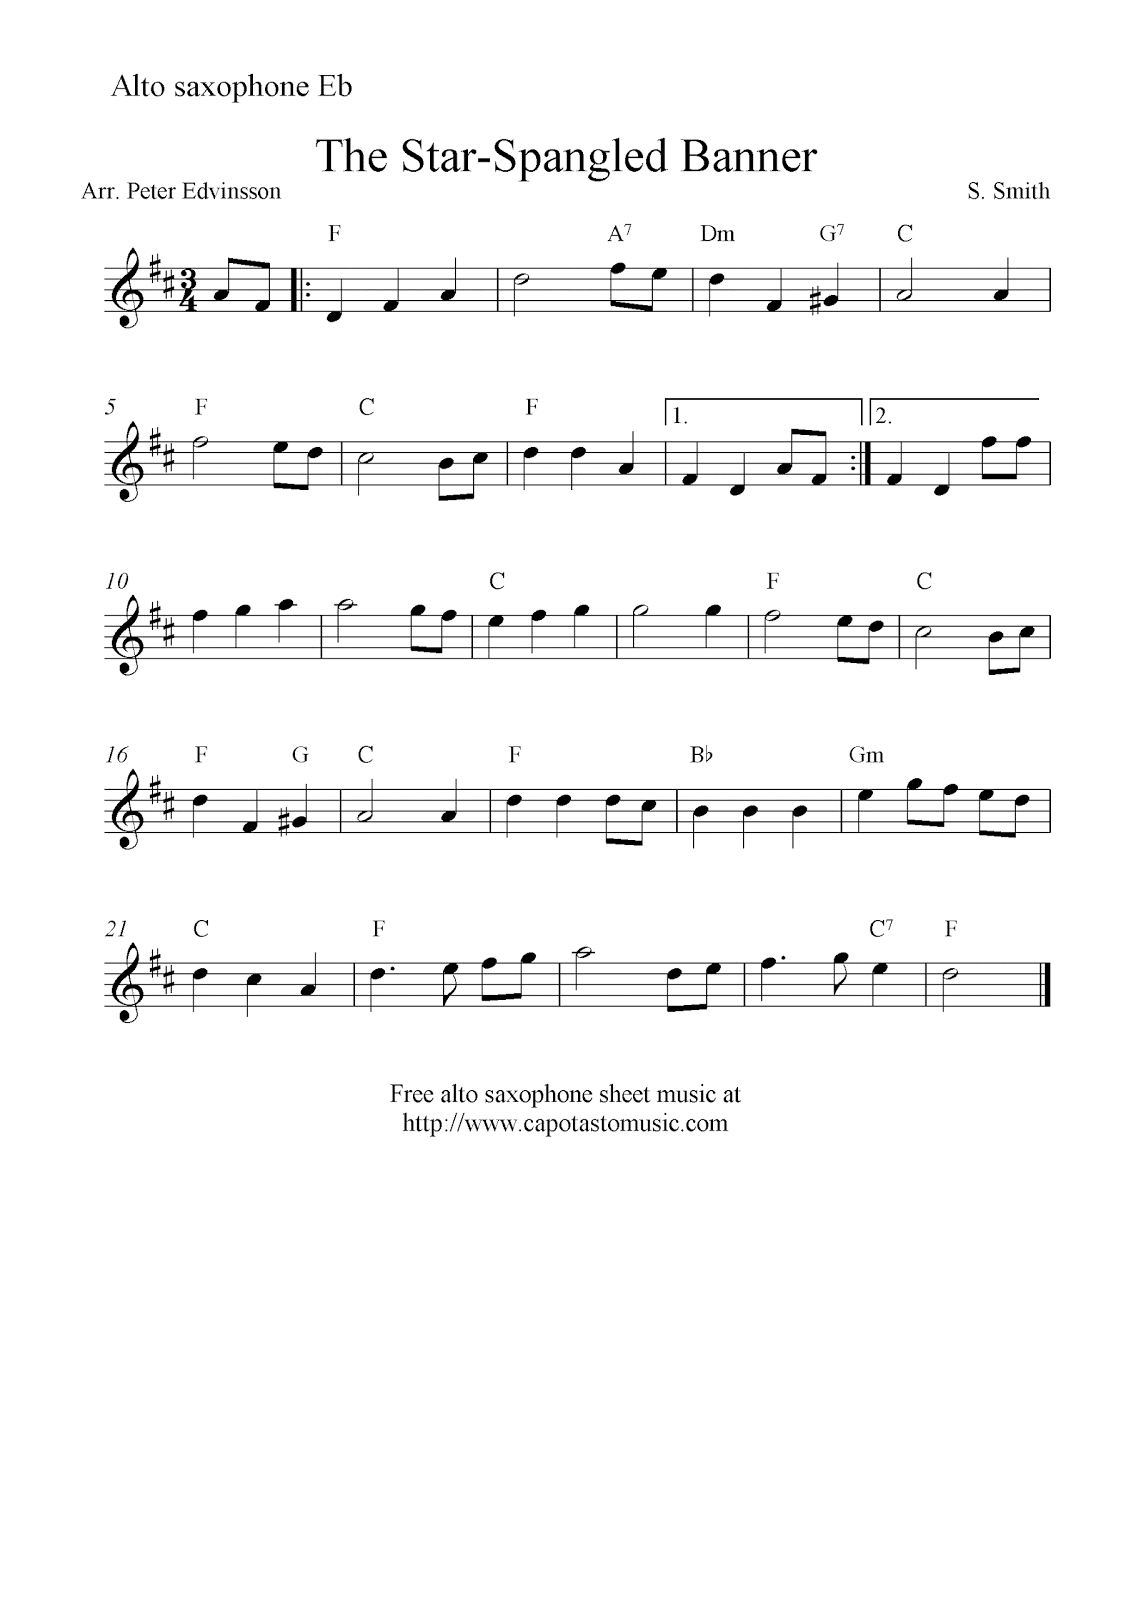 The Star-Spangled Banner, Free Alto Saxophone Sheet Music Notes - Free Printable Piano Sheet Music For The Star Spangled Banner